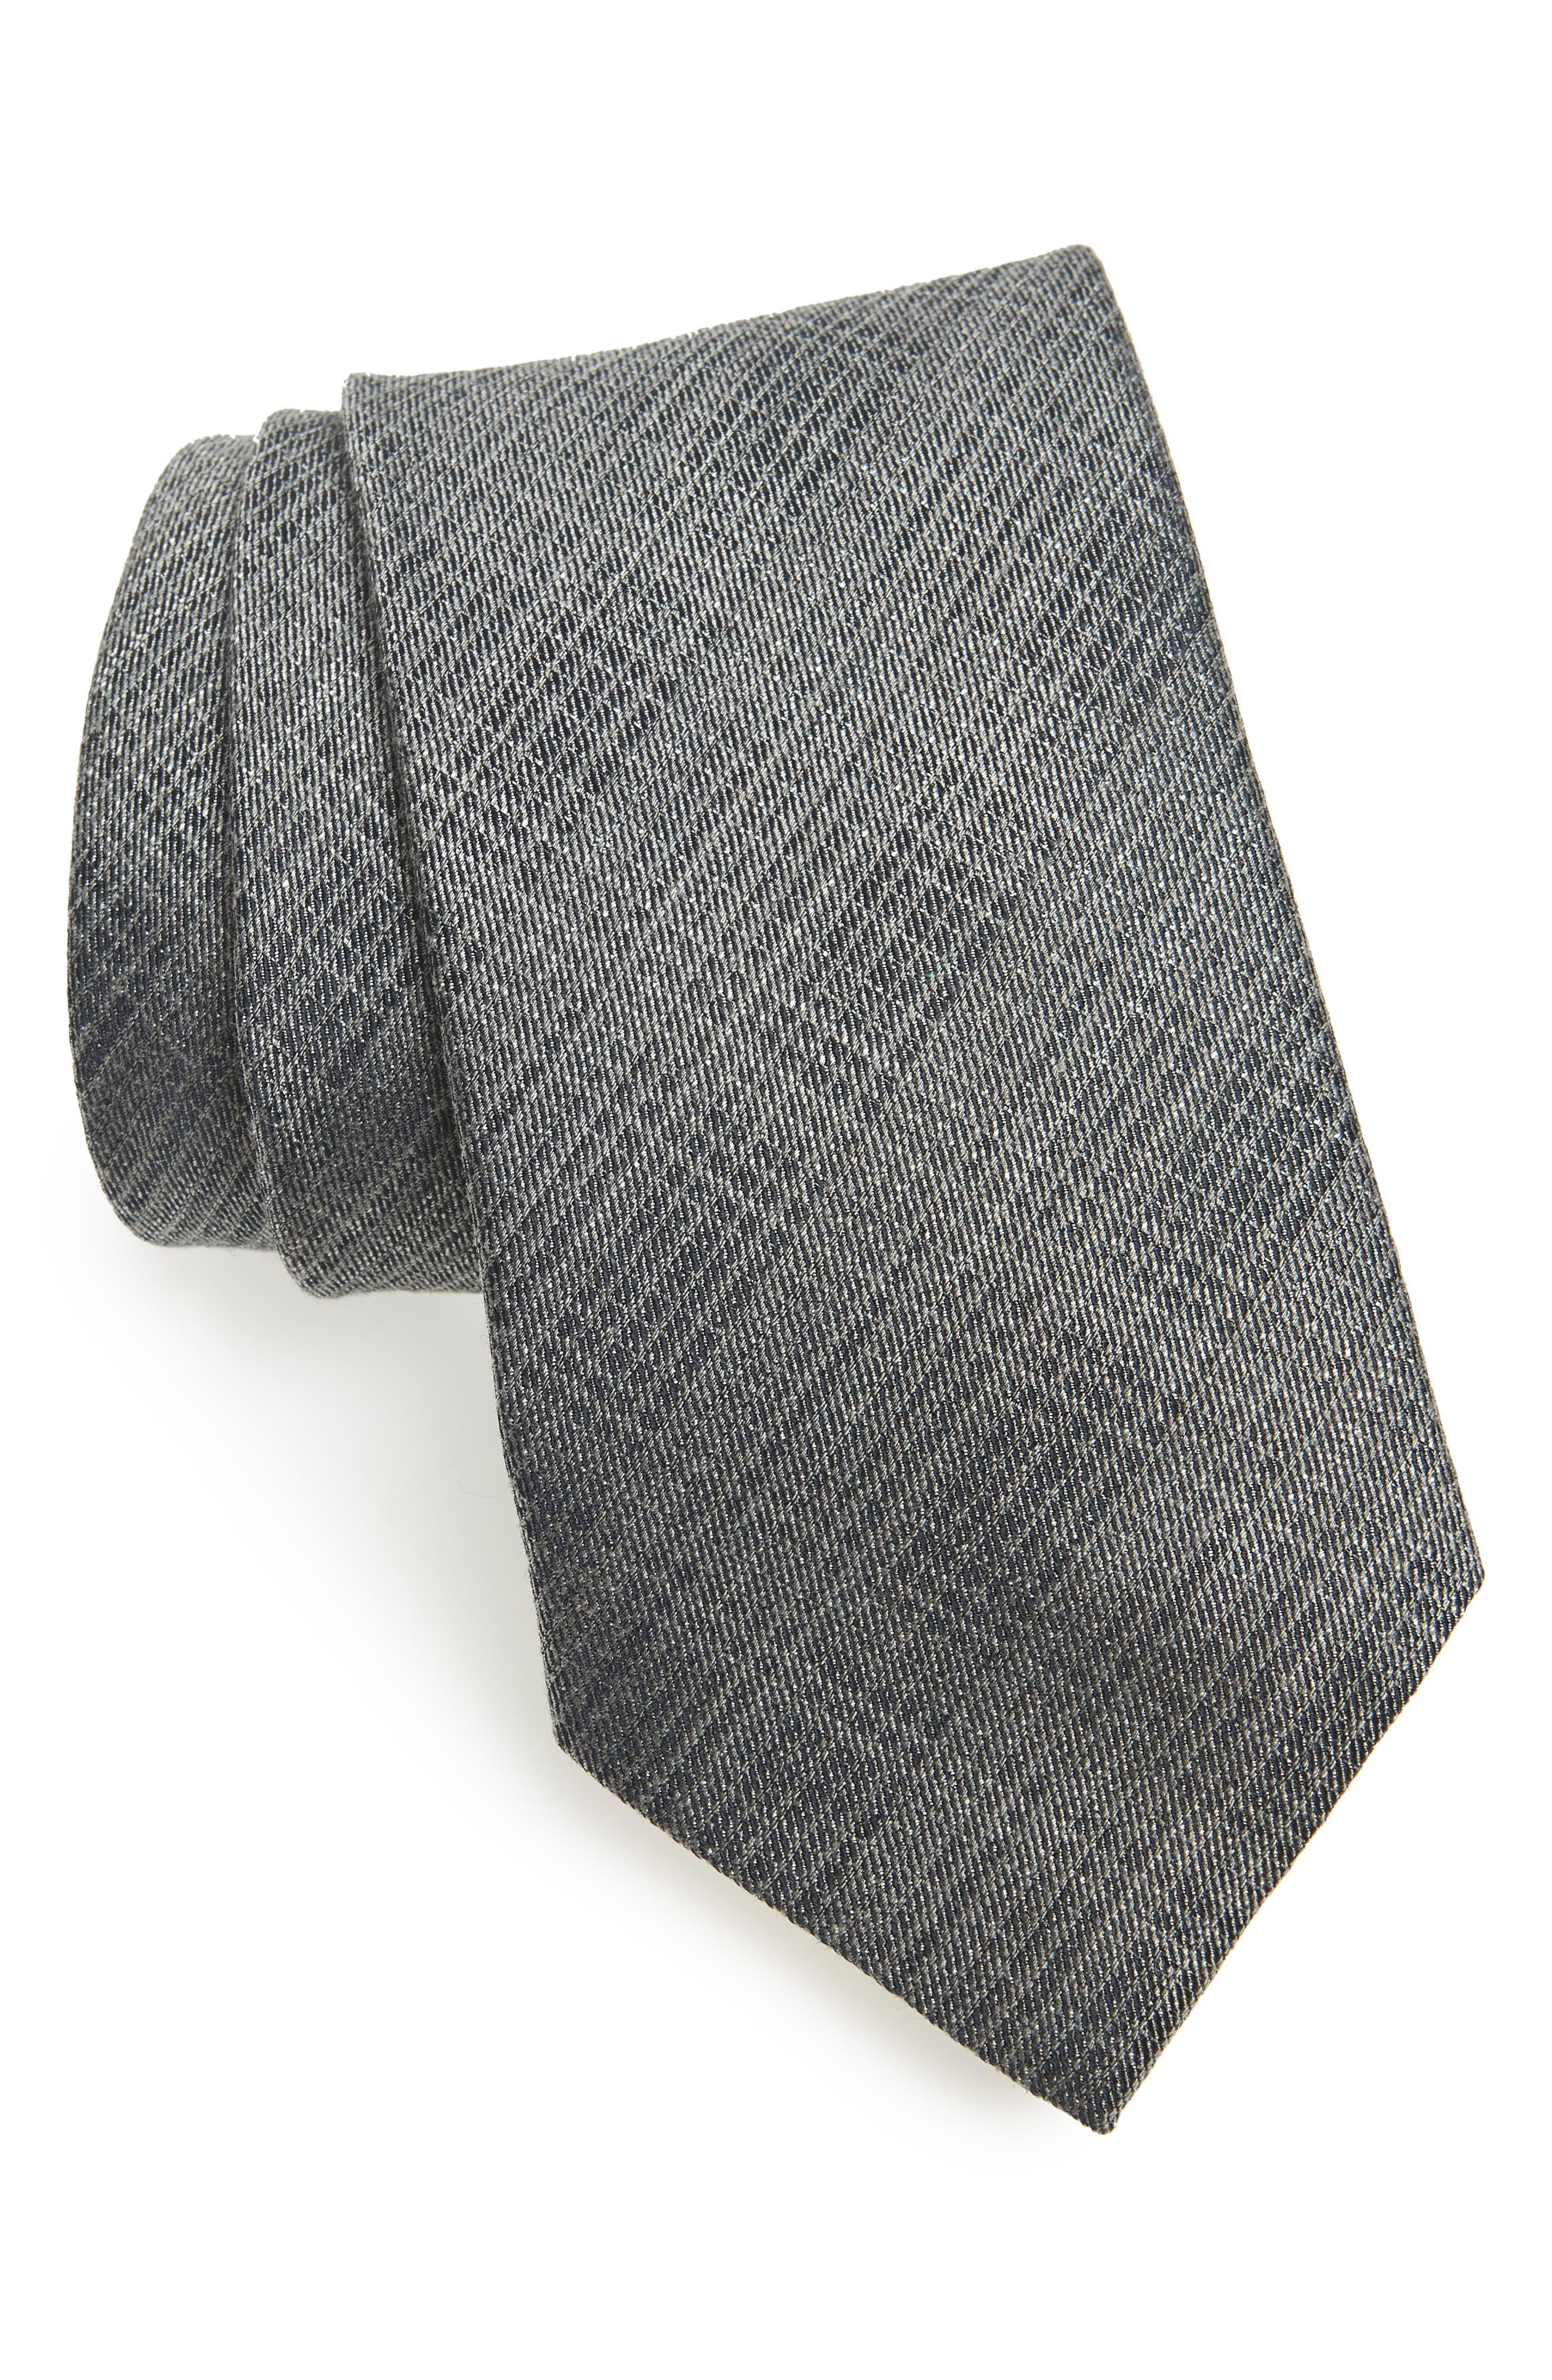 Crosshatch Tie,                             Main thumbnail 1, color,                             SILVER GREY